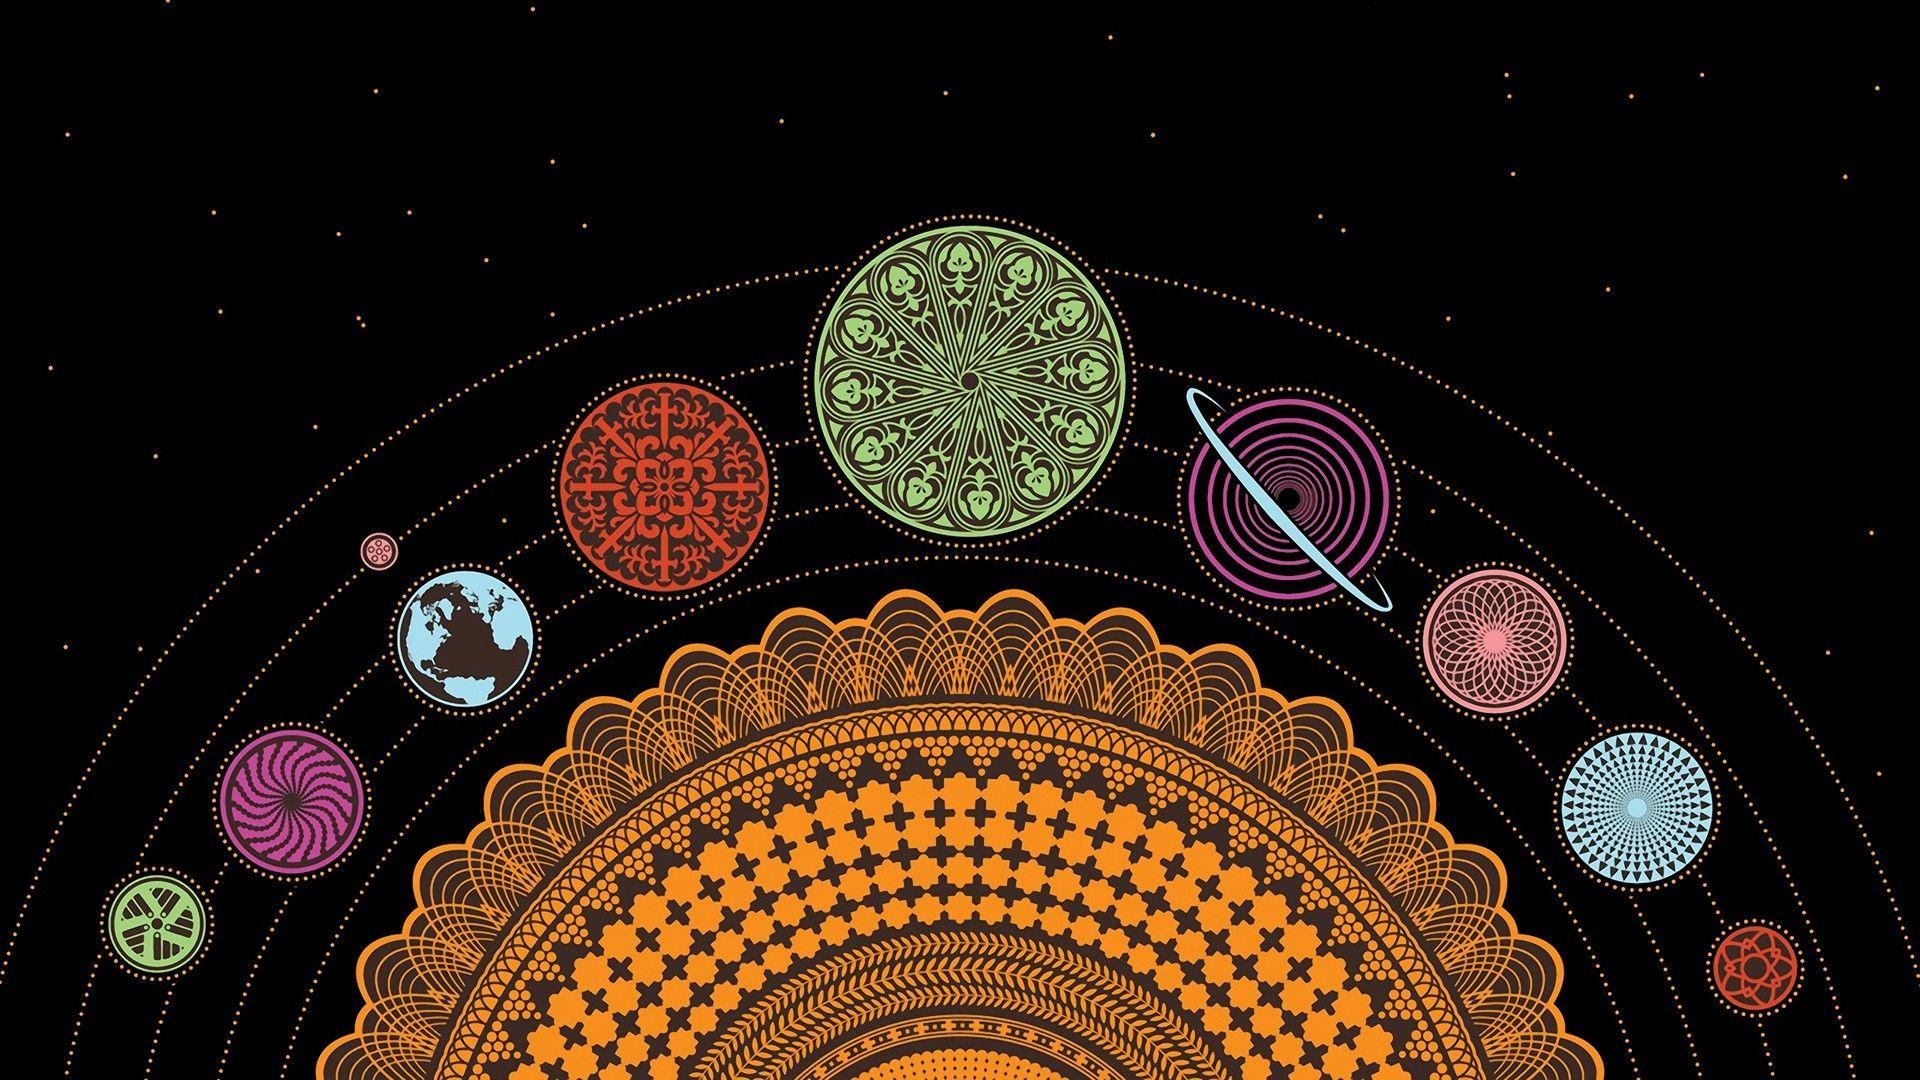 1920x1080 Minimalism Space Universe Steven Universe